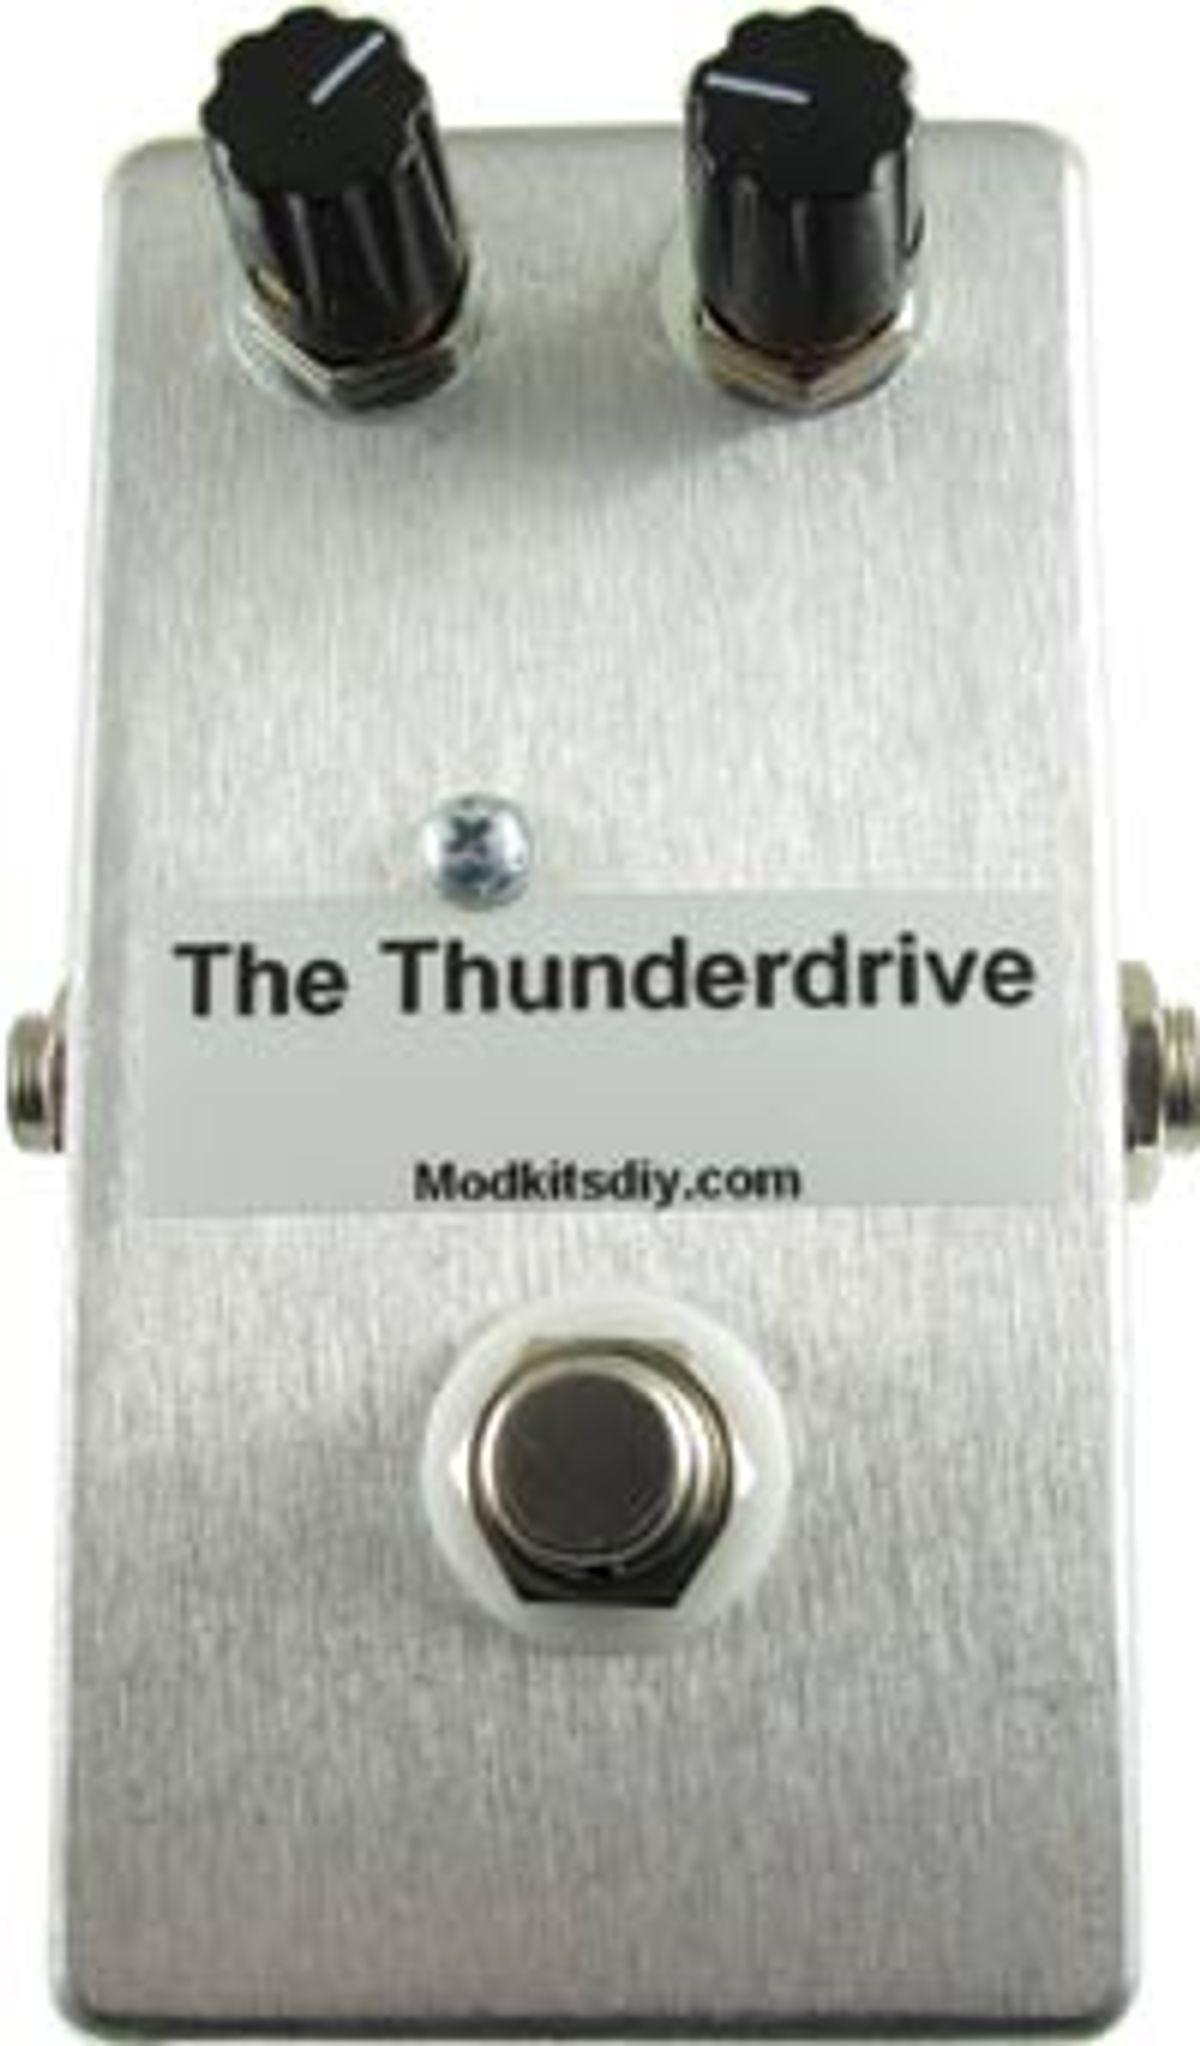 Mod Kits DIY Releases the Thunderdrive Pedal Kit